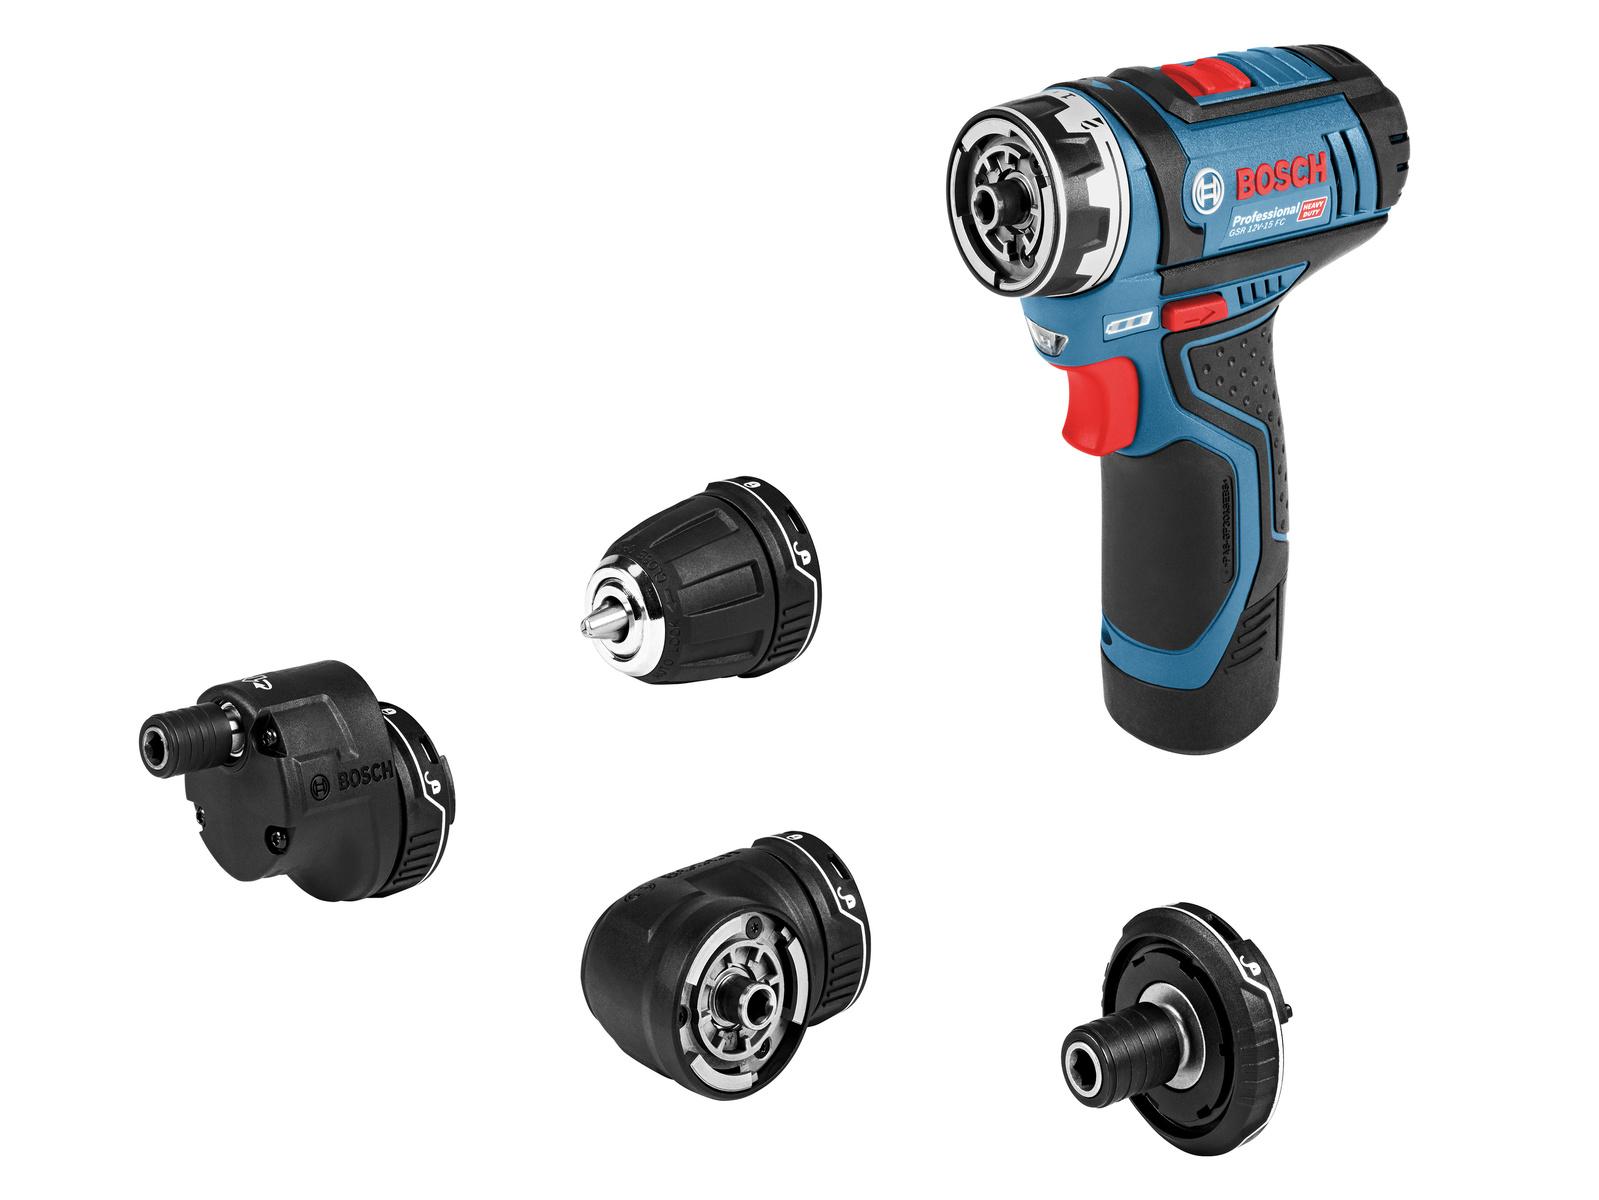 Bosch FlexiClick – now as a 12 volt version - Bosch Media